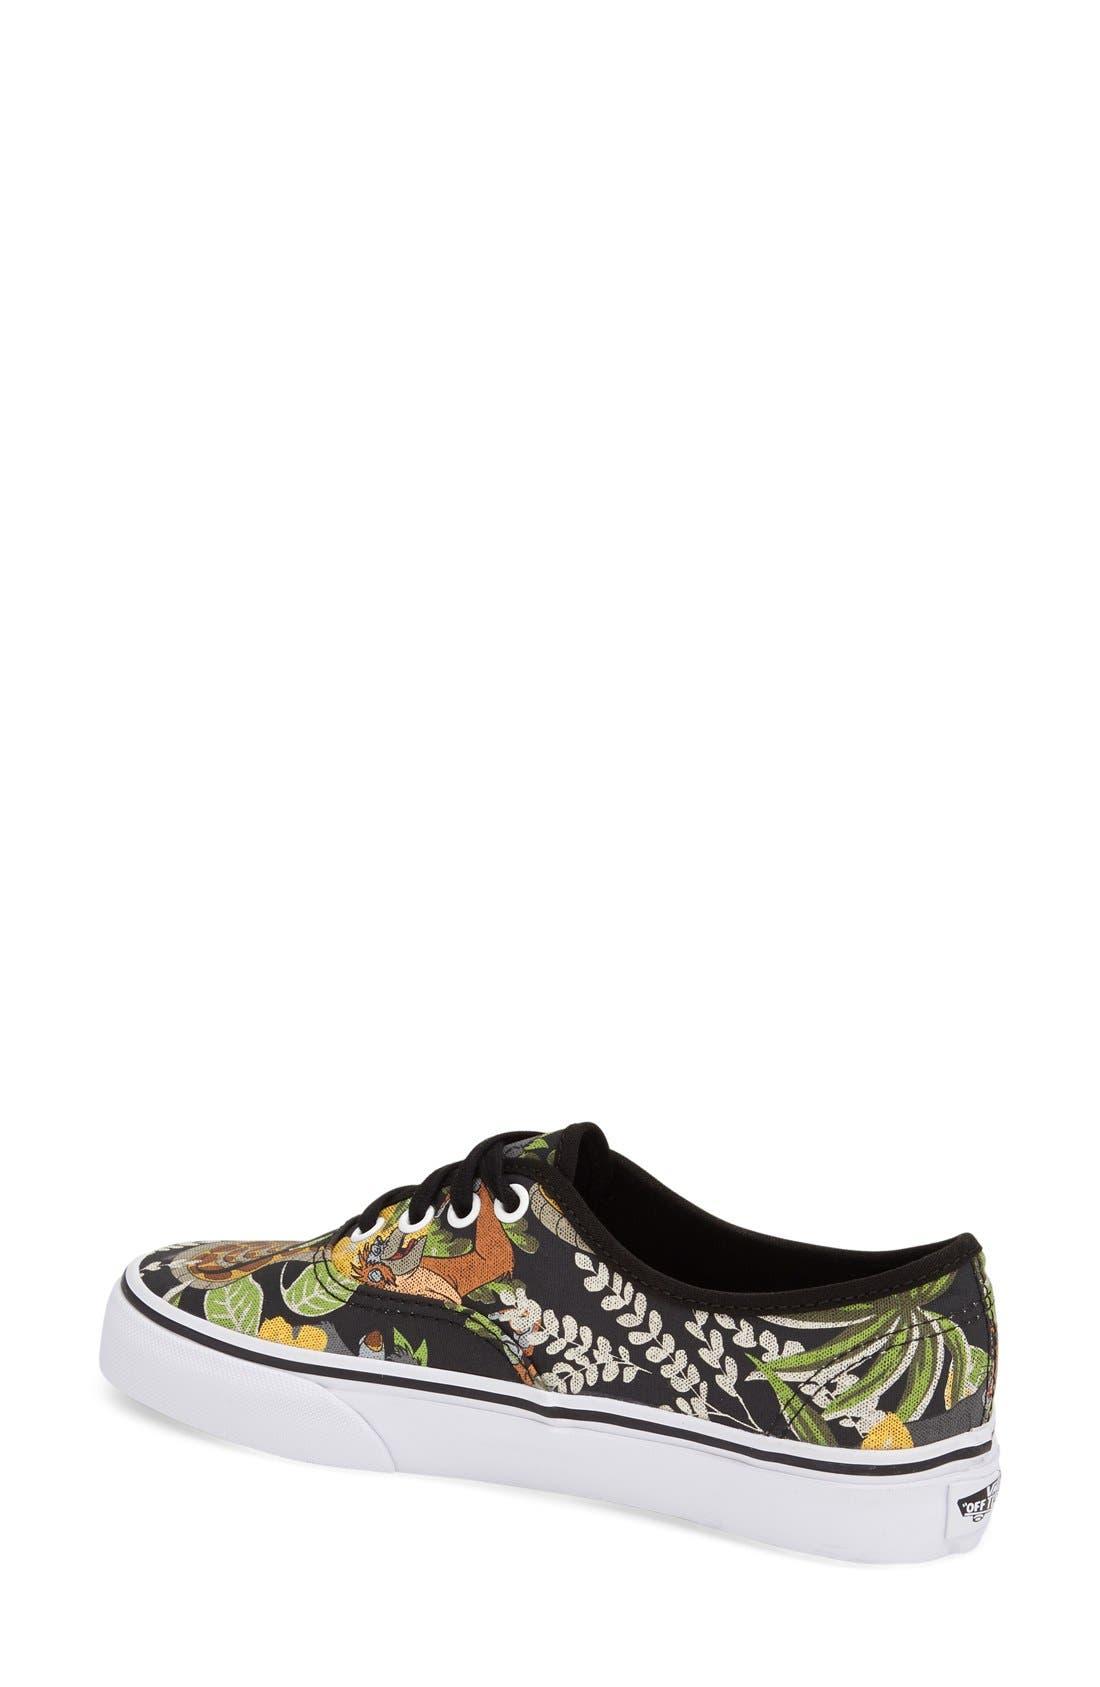 Alternate Image 2  - Vans 'Authentic - Disney® The Jungle Book' Sneaker (Women)